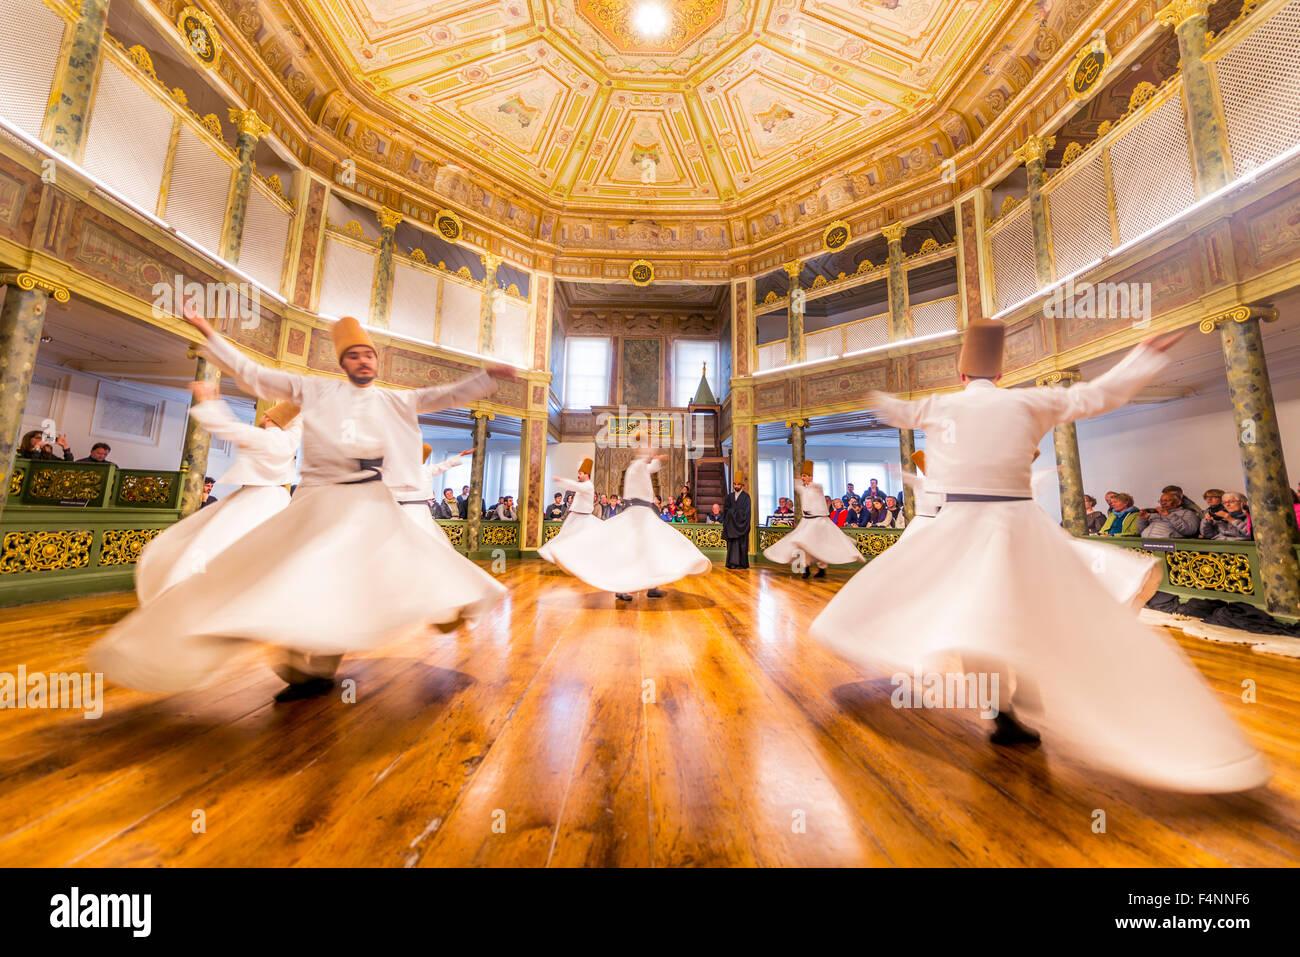 Dancing dervishes from the Sufi Mevlevi Order, Sema-Zerimonie, dervish dance, Sema, Mevlevihanesi Müzesi, Istanbul, - Stock Image